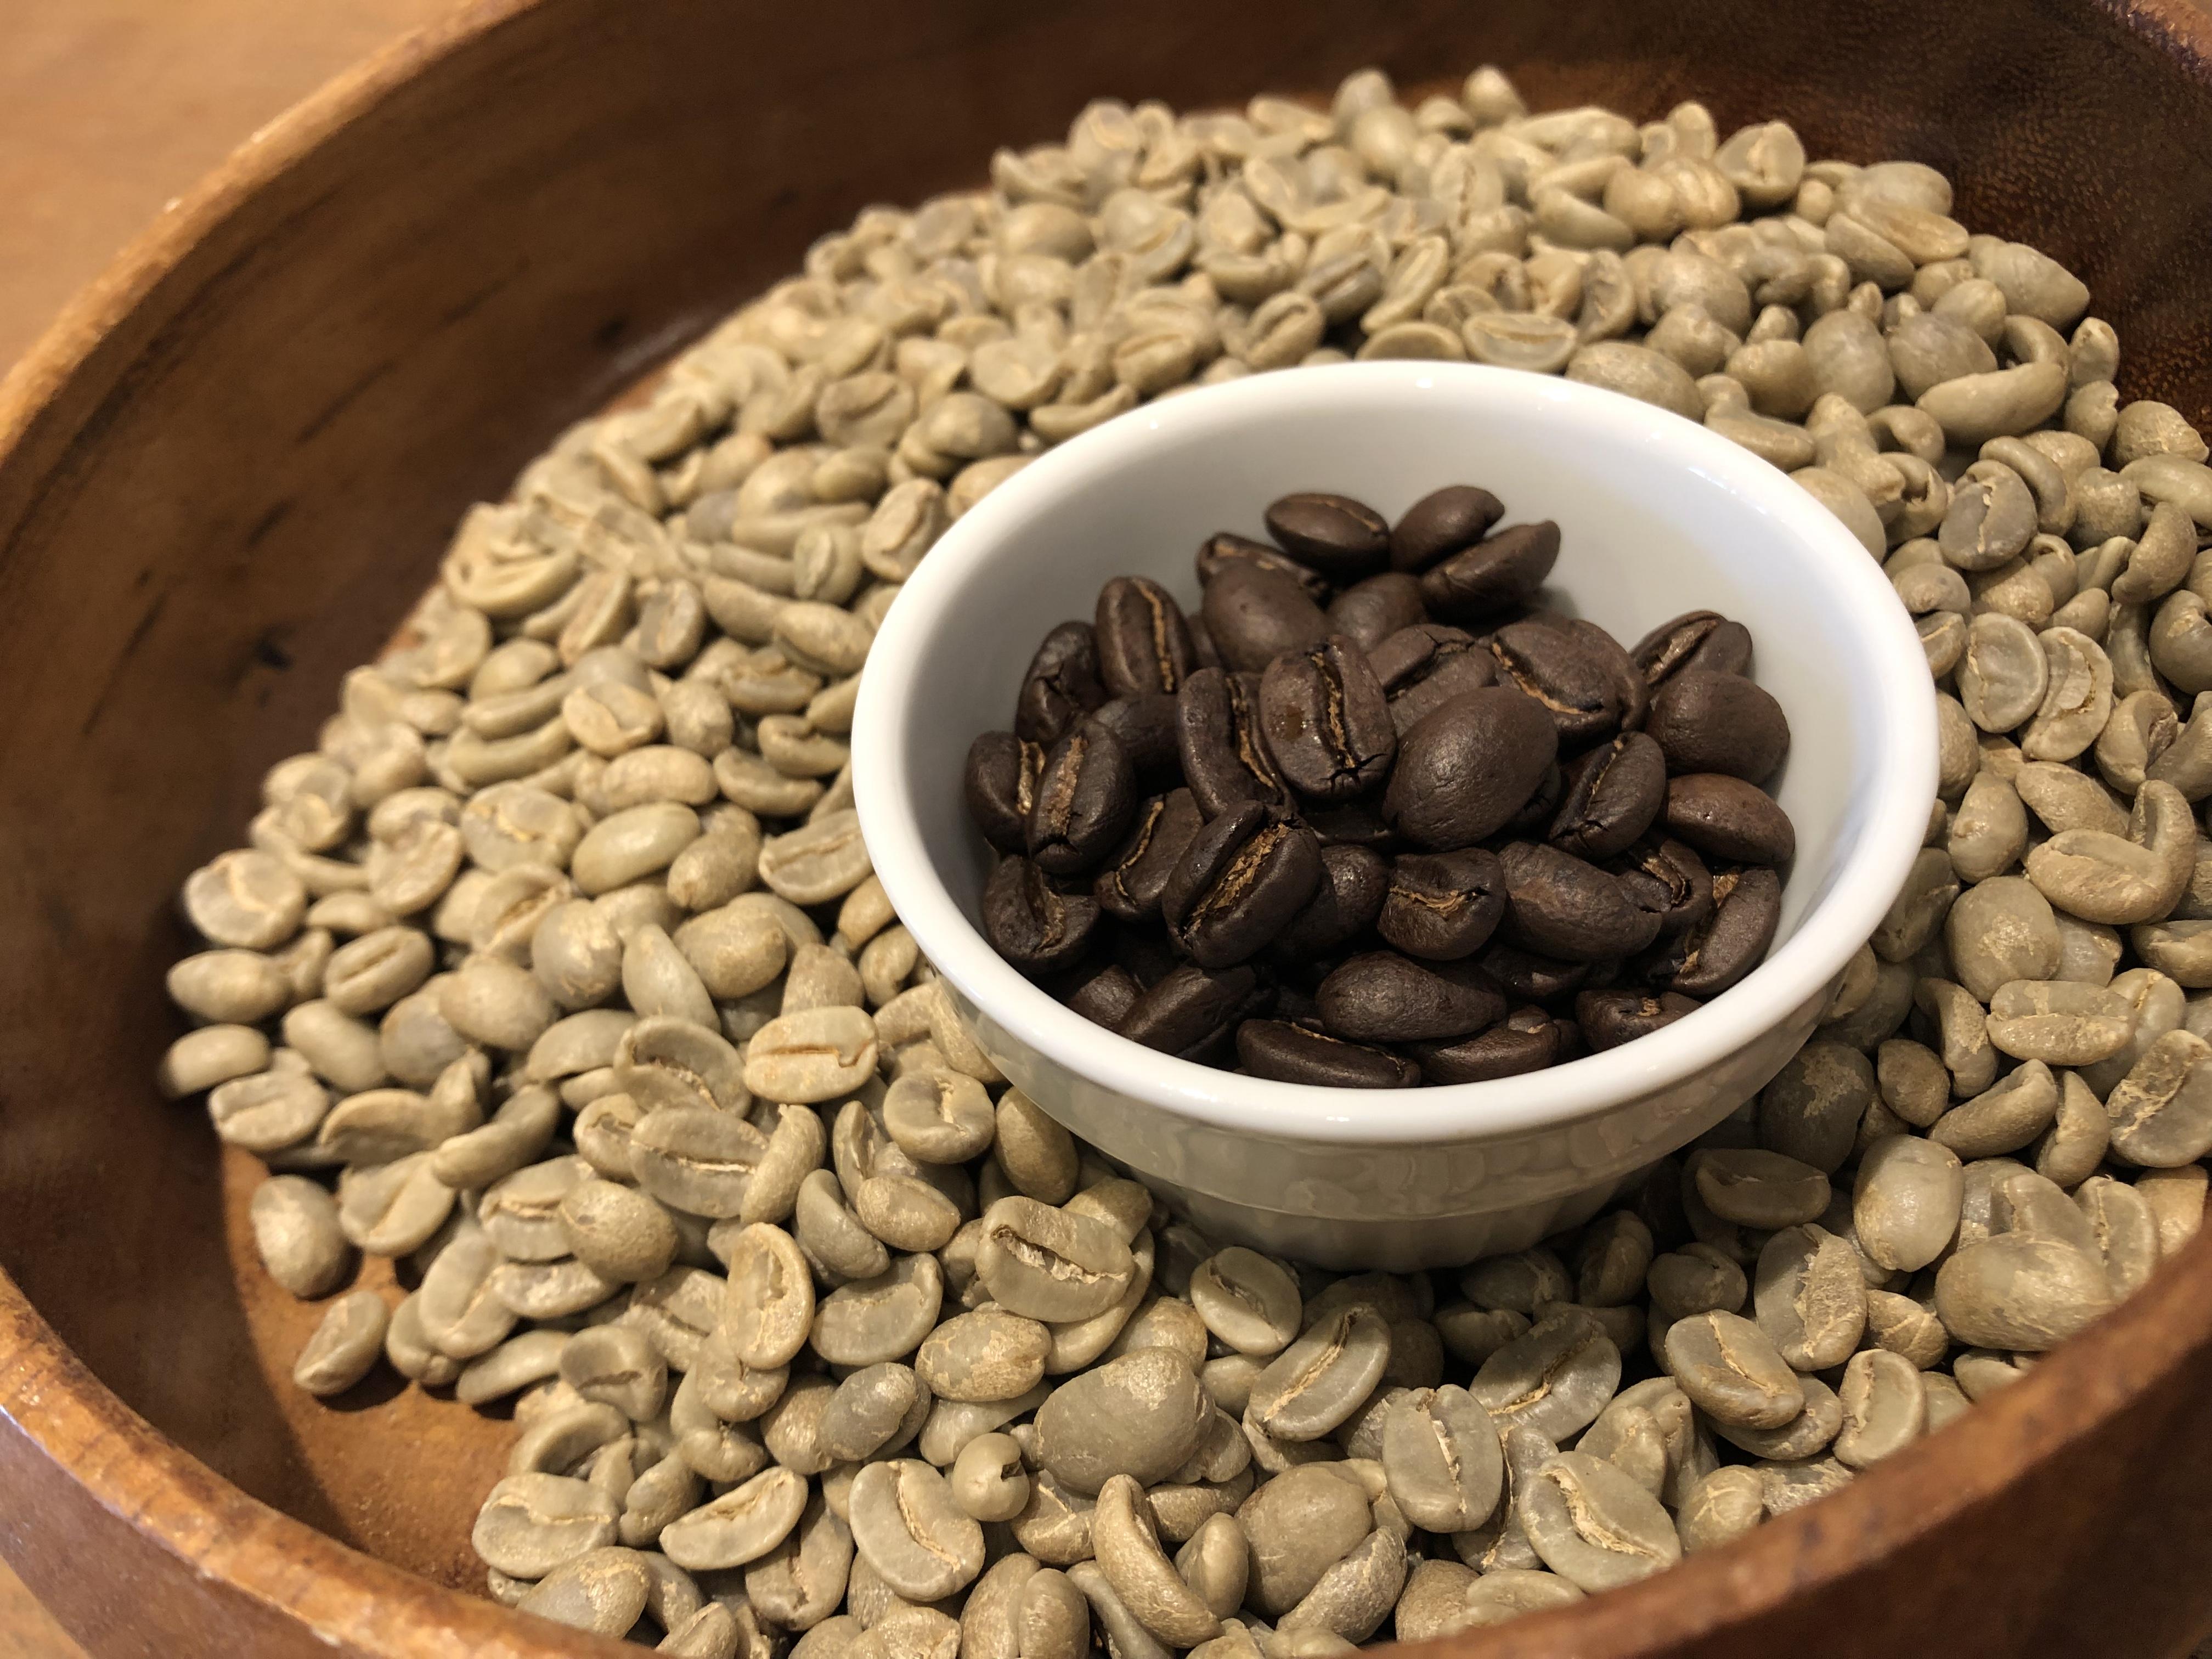 【NEWOPEN】西予市宇和町に自家焙煎オーガニックコーヒーの店「LOKKi COFFEE」(ロキコーヒー)がオープンしたので行ってきたよ!